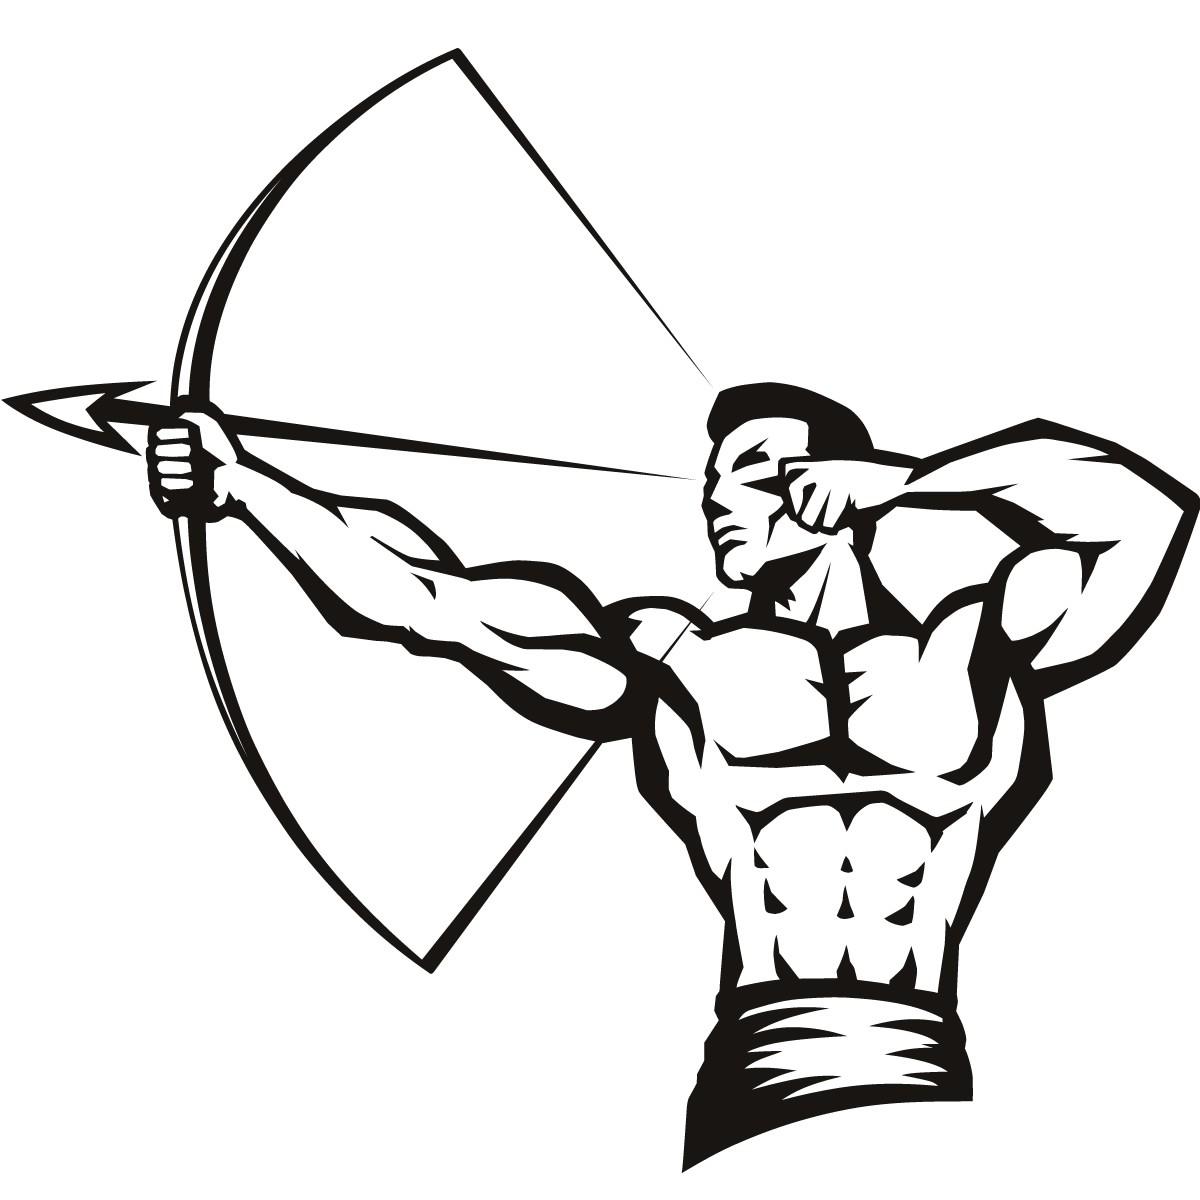 Archery clipart logo. Sports cad irononsticker com